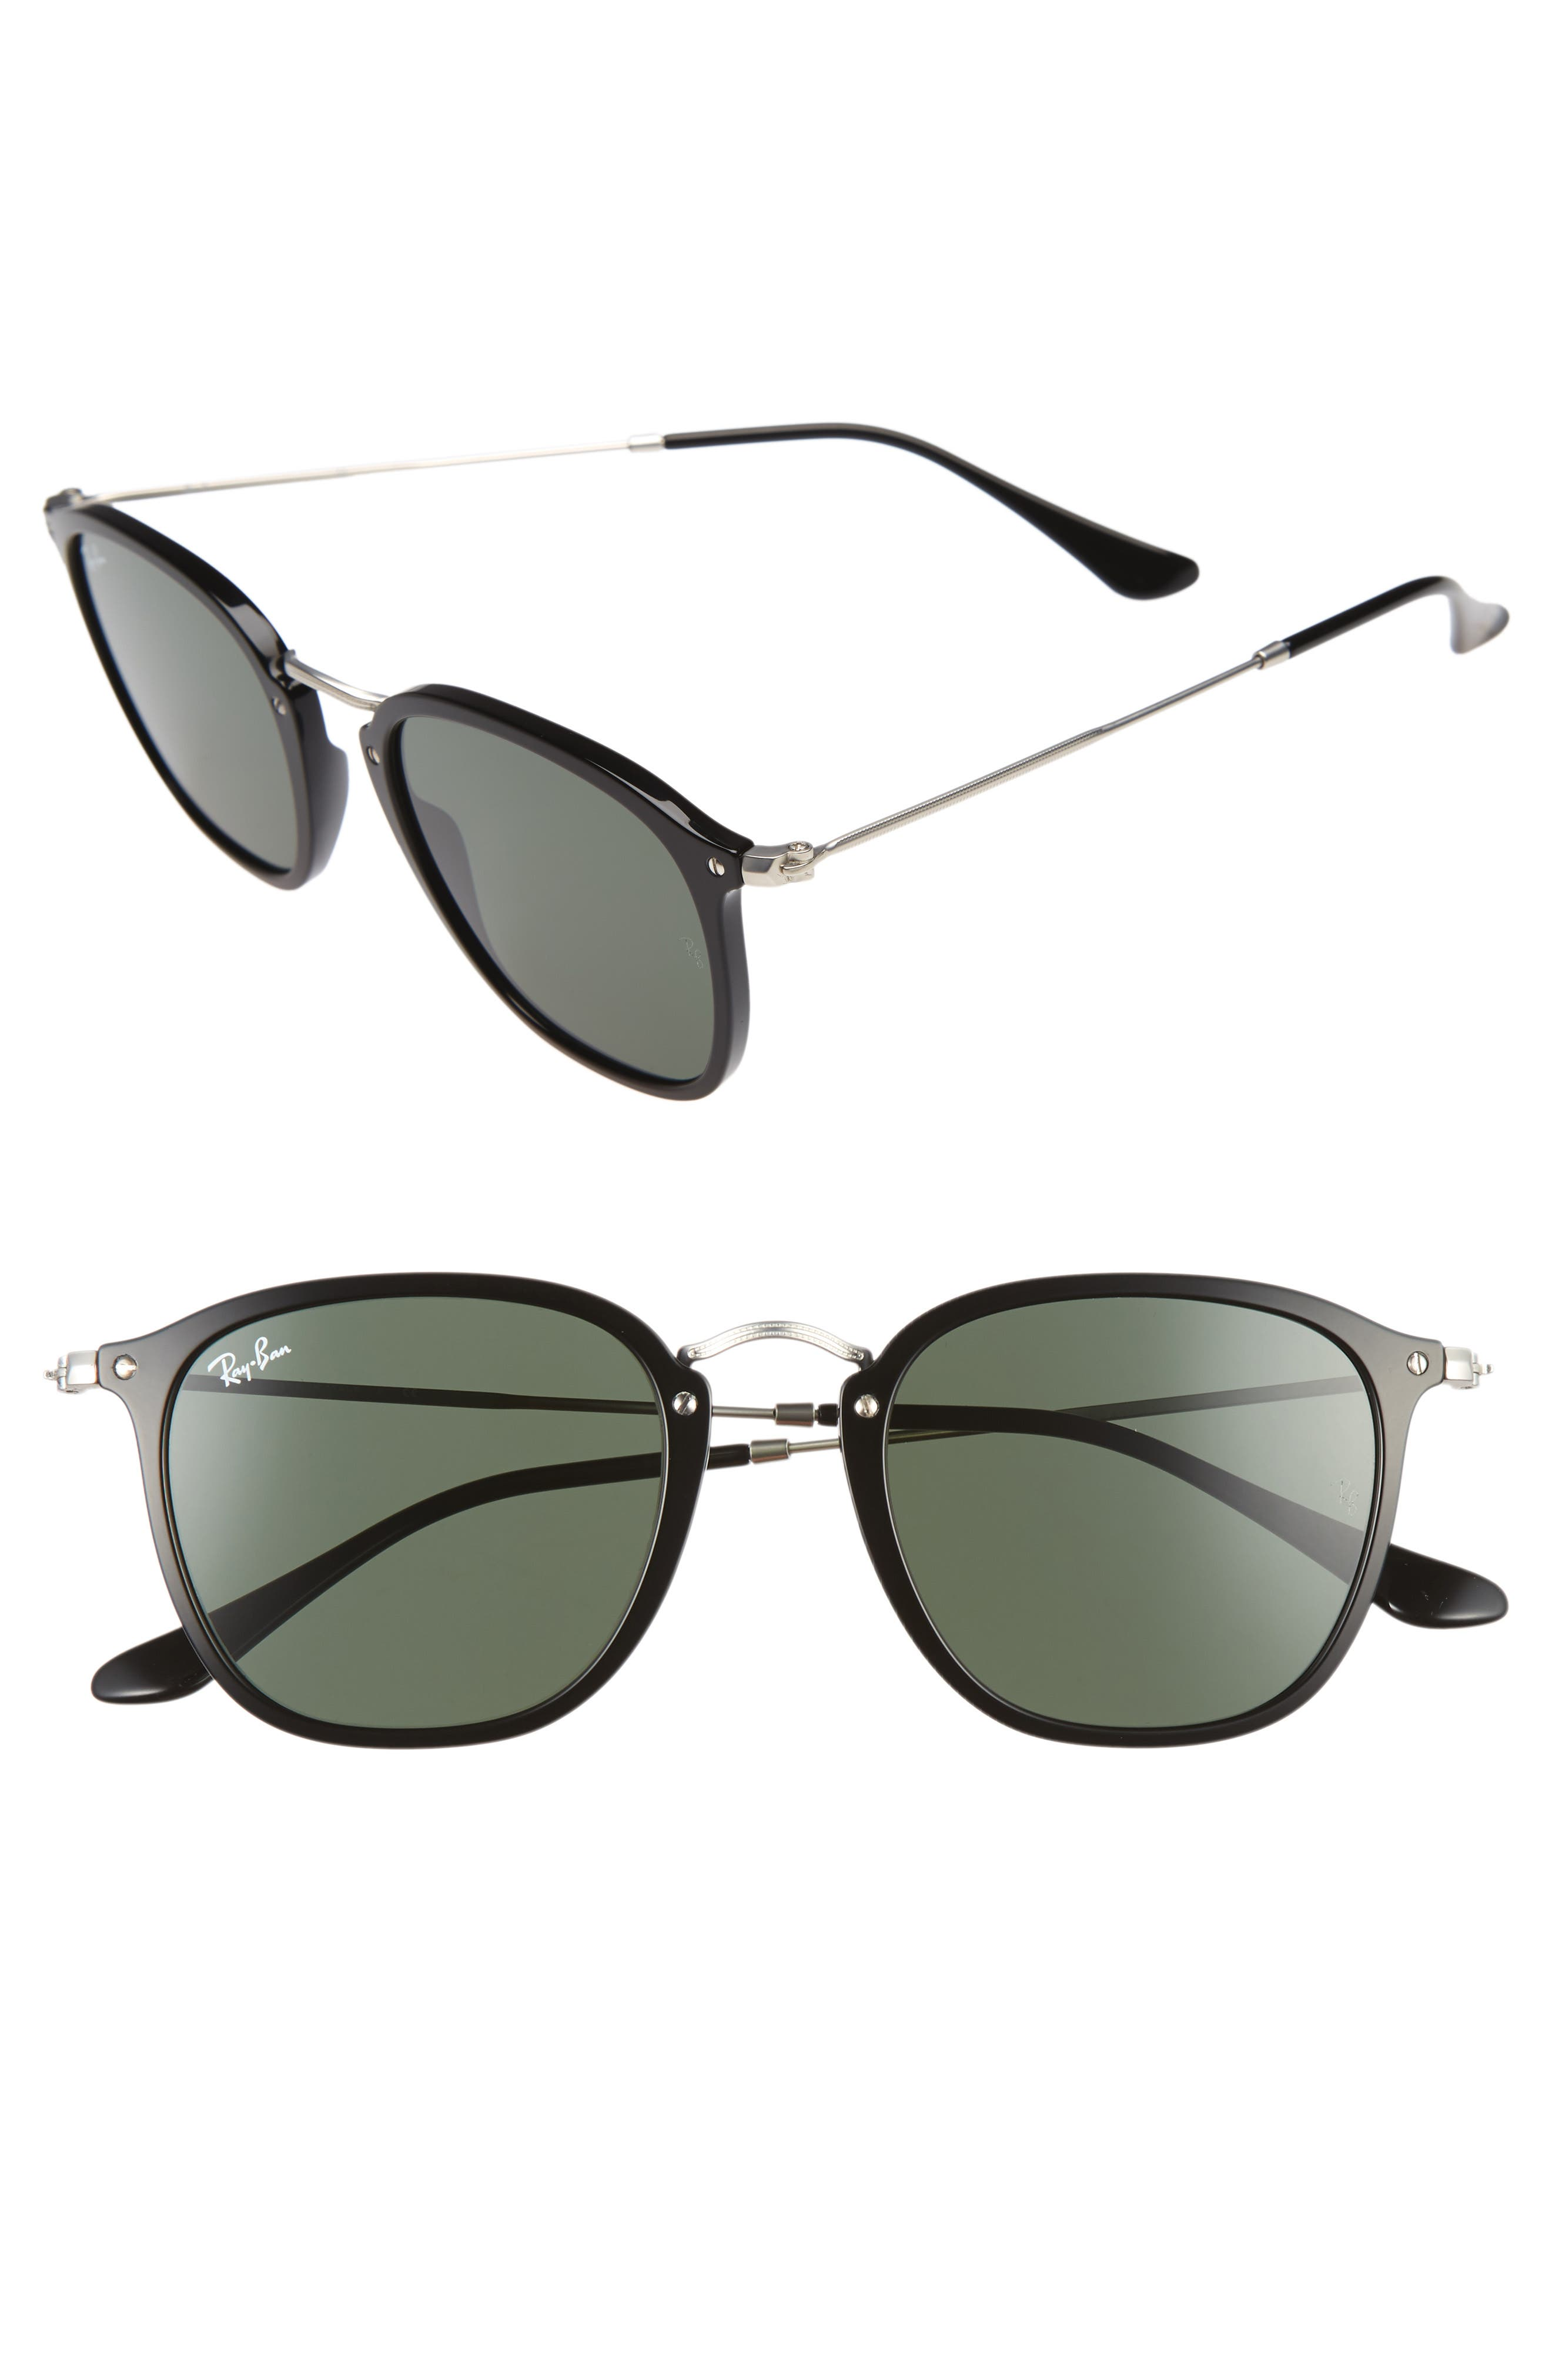 Icons 51mm Aviator Sunglasses,                         Main,                         color, Black